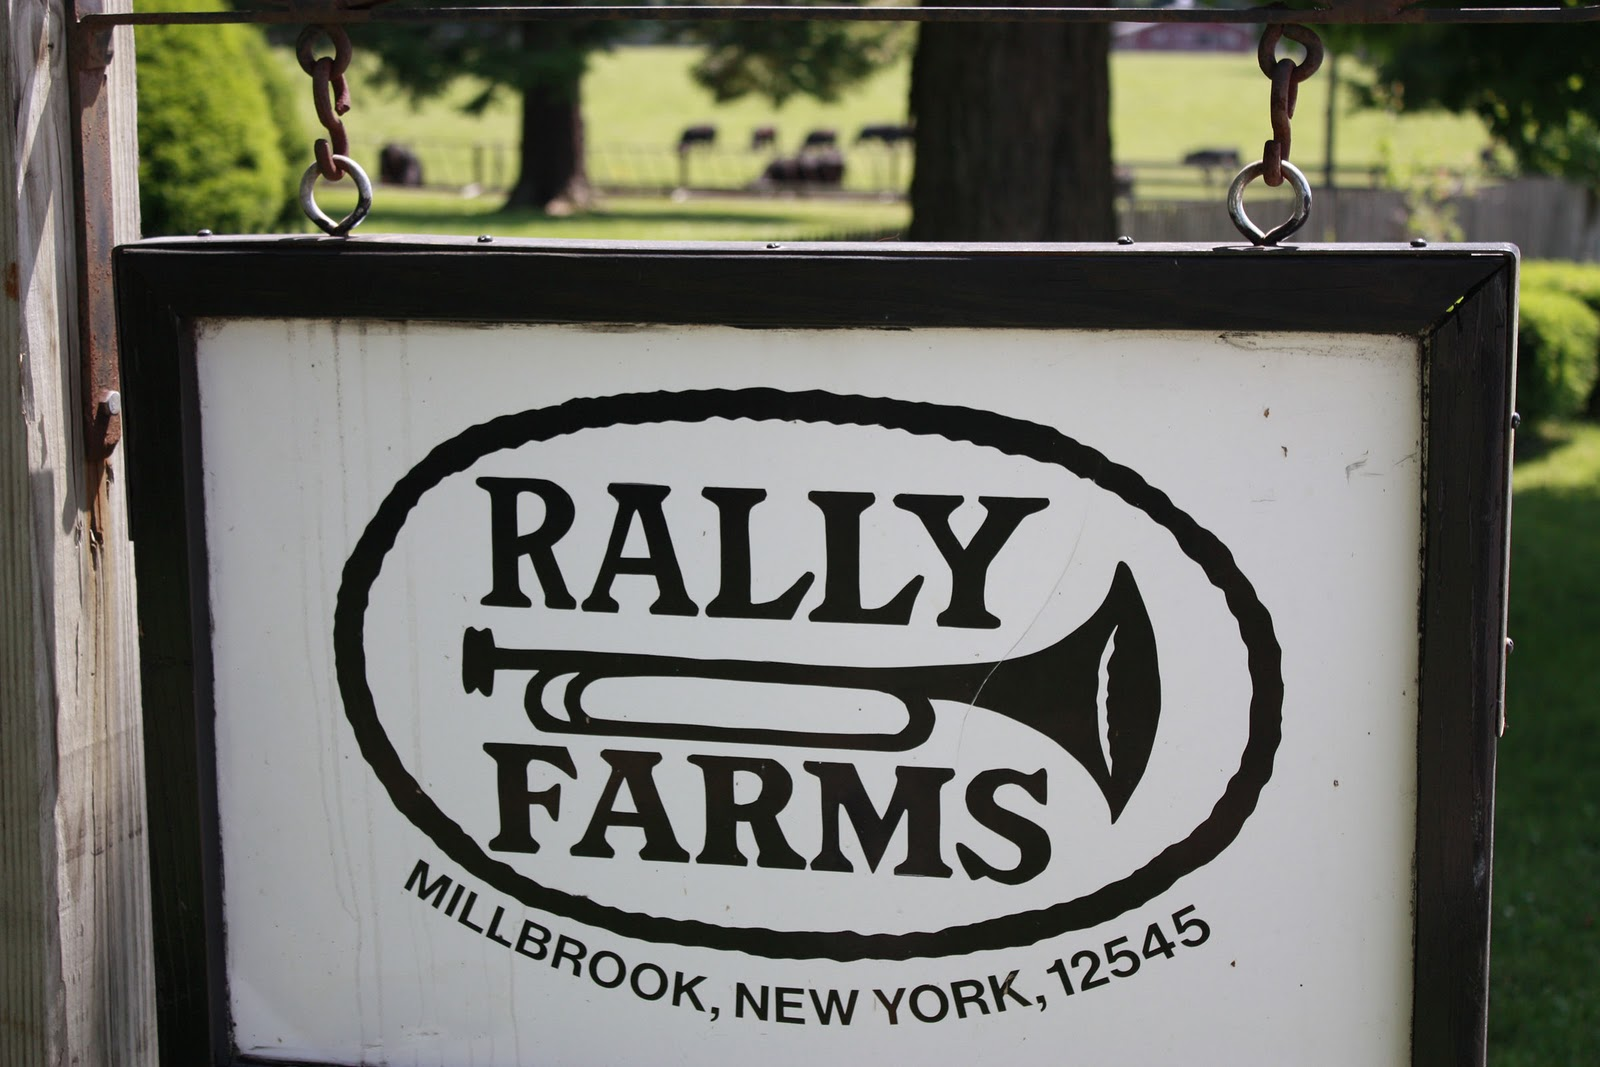 http://2.bp.blogspot.com/_mJUSNgThx1Y/TCFz3PZ9dxI/AAAAAAAAAc4/4rsJays2HsM/s1600/Rally+Farms_day3+018.jpeg